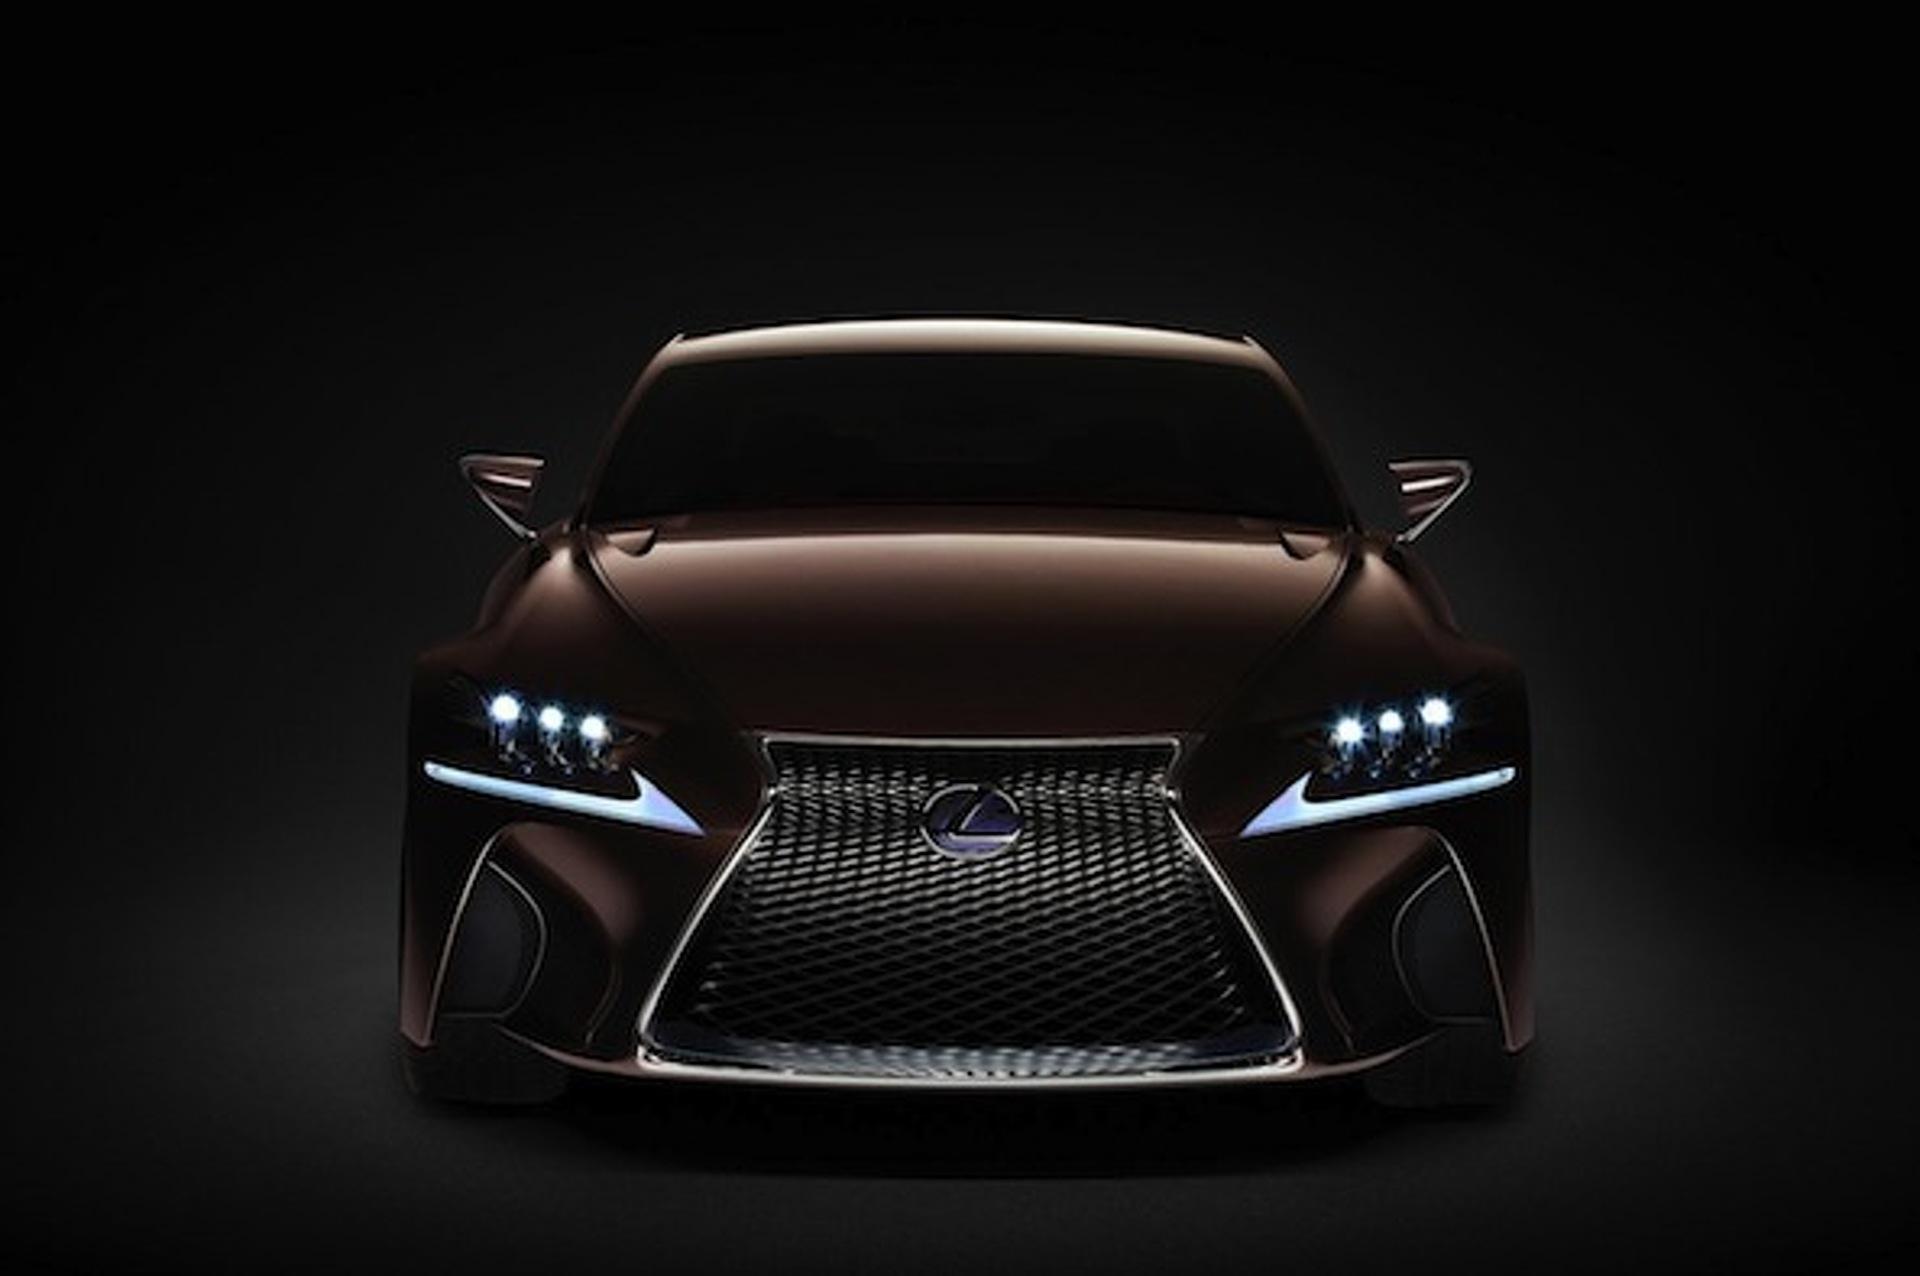 Lexus Teases New Concept for Frankfurt Motor Show